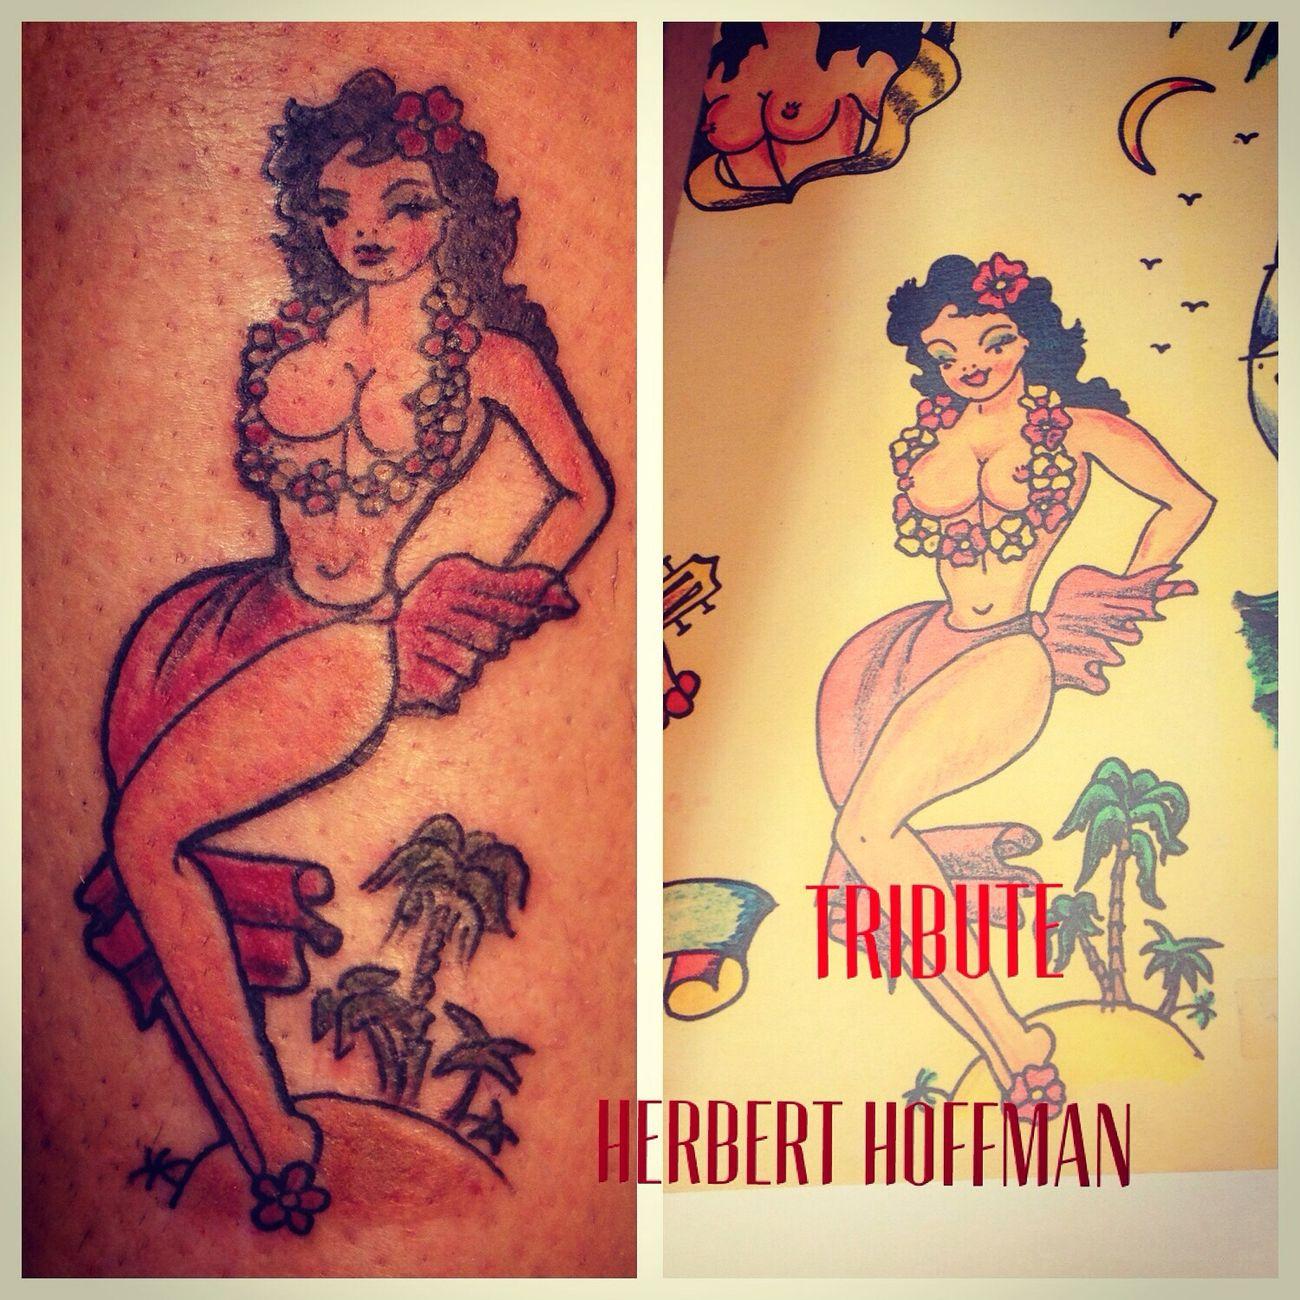 Herbert hoffman tribute Getting Inked No Pain, No Gain Tattoo inked tattoo Inked